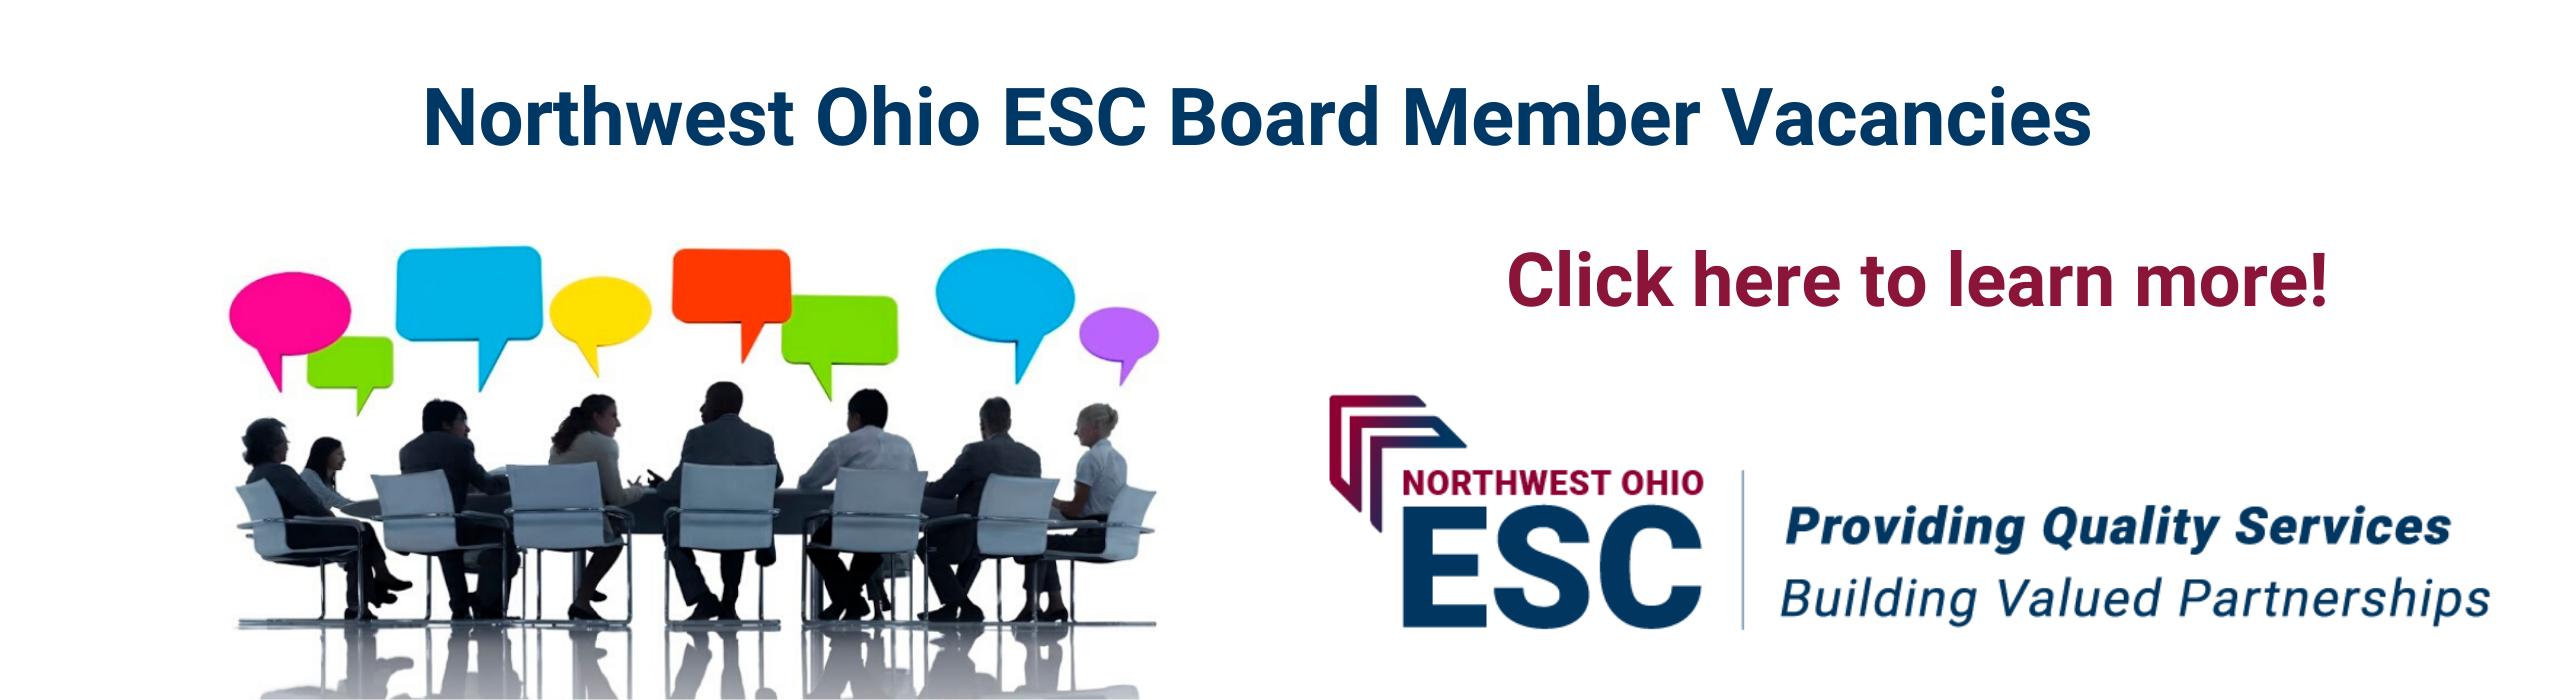 Board Member Vacancies